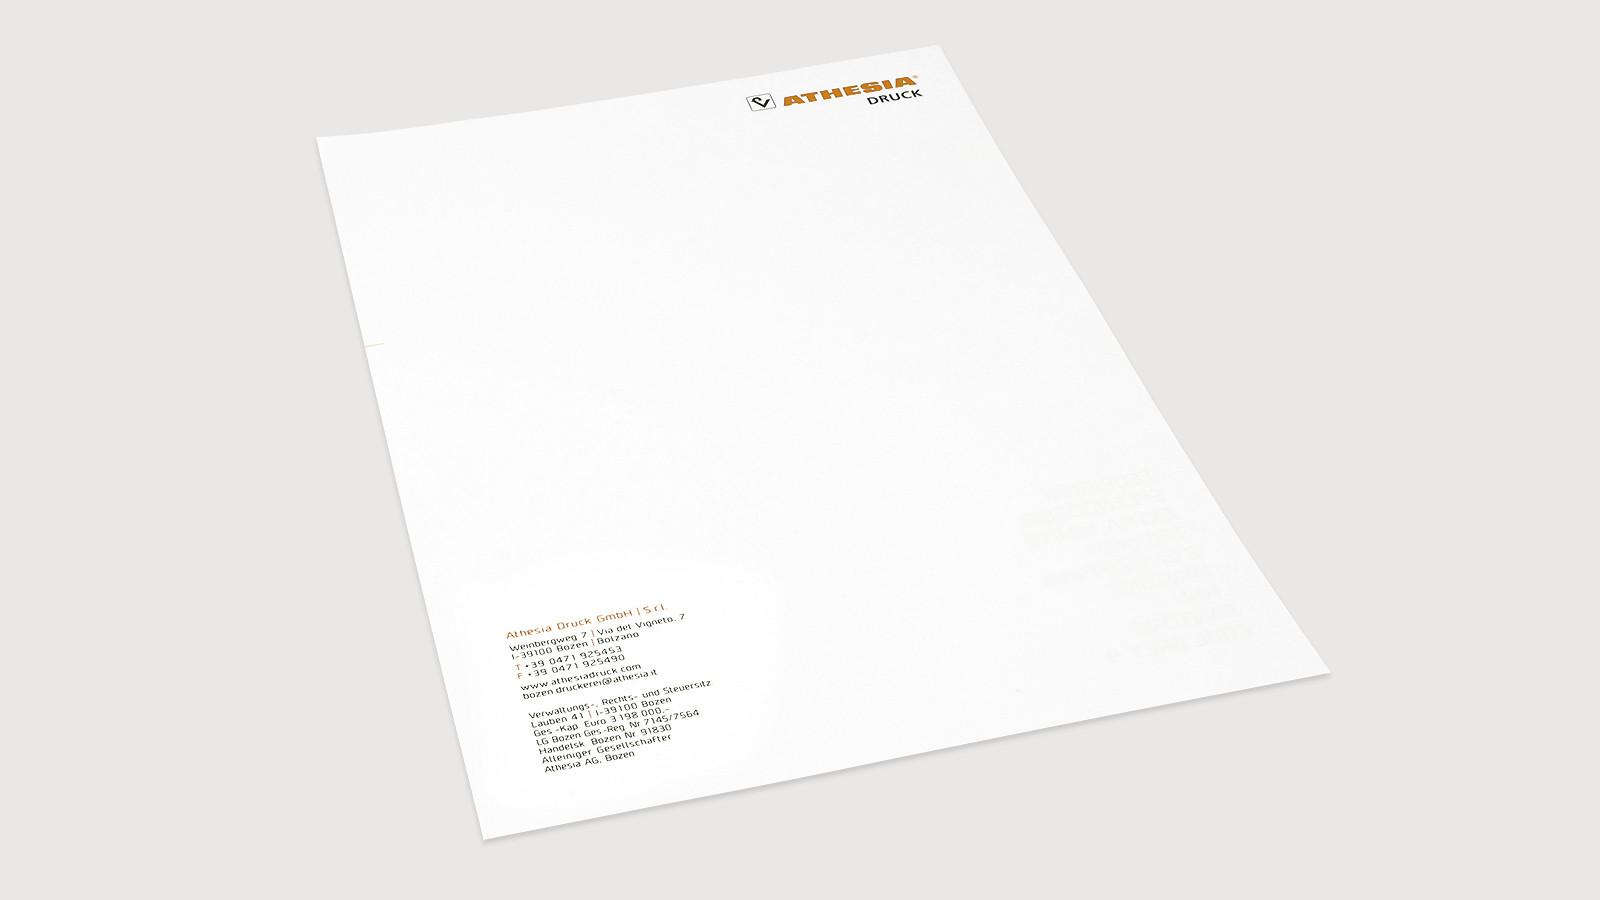 Briefpapier_Athesia_01.jpg